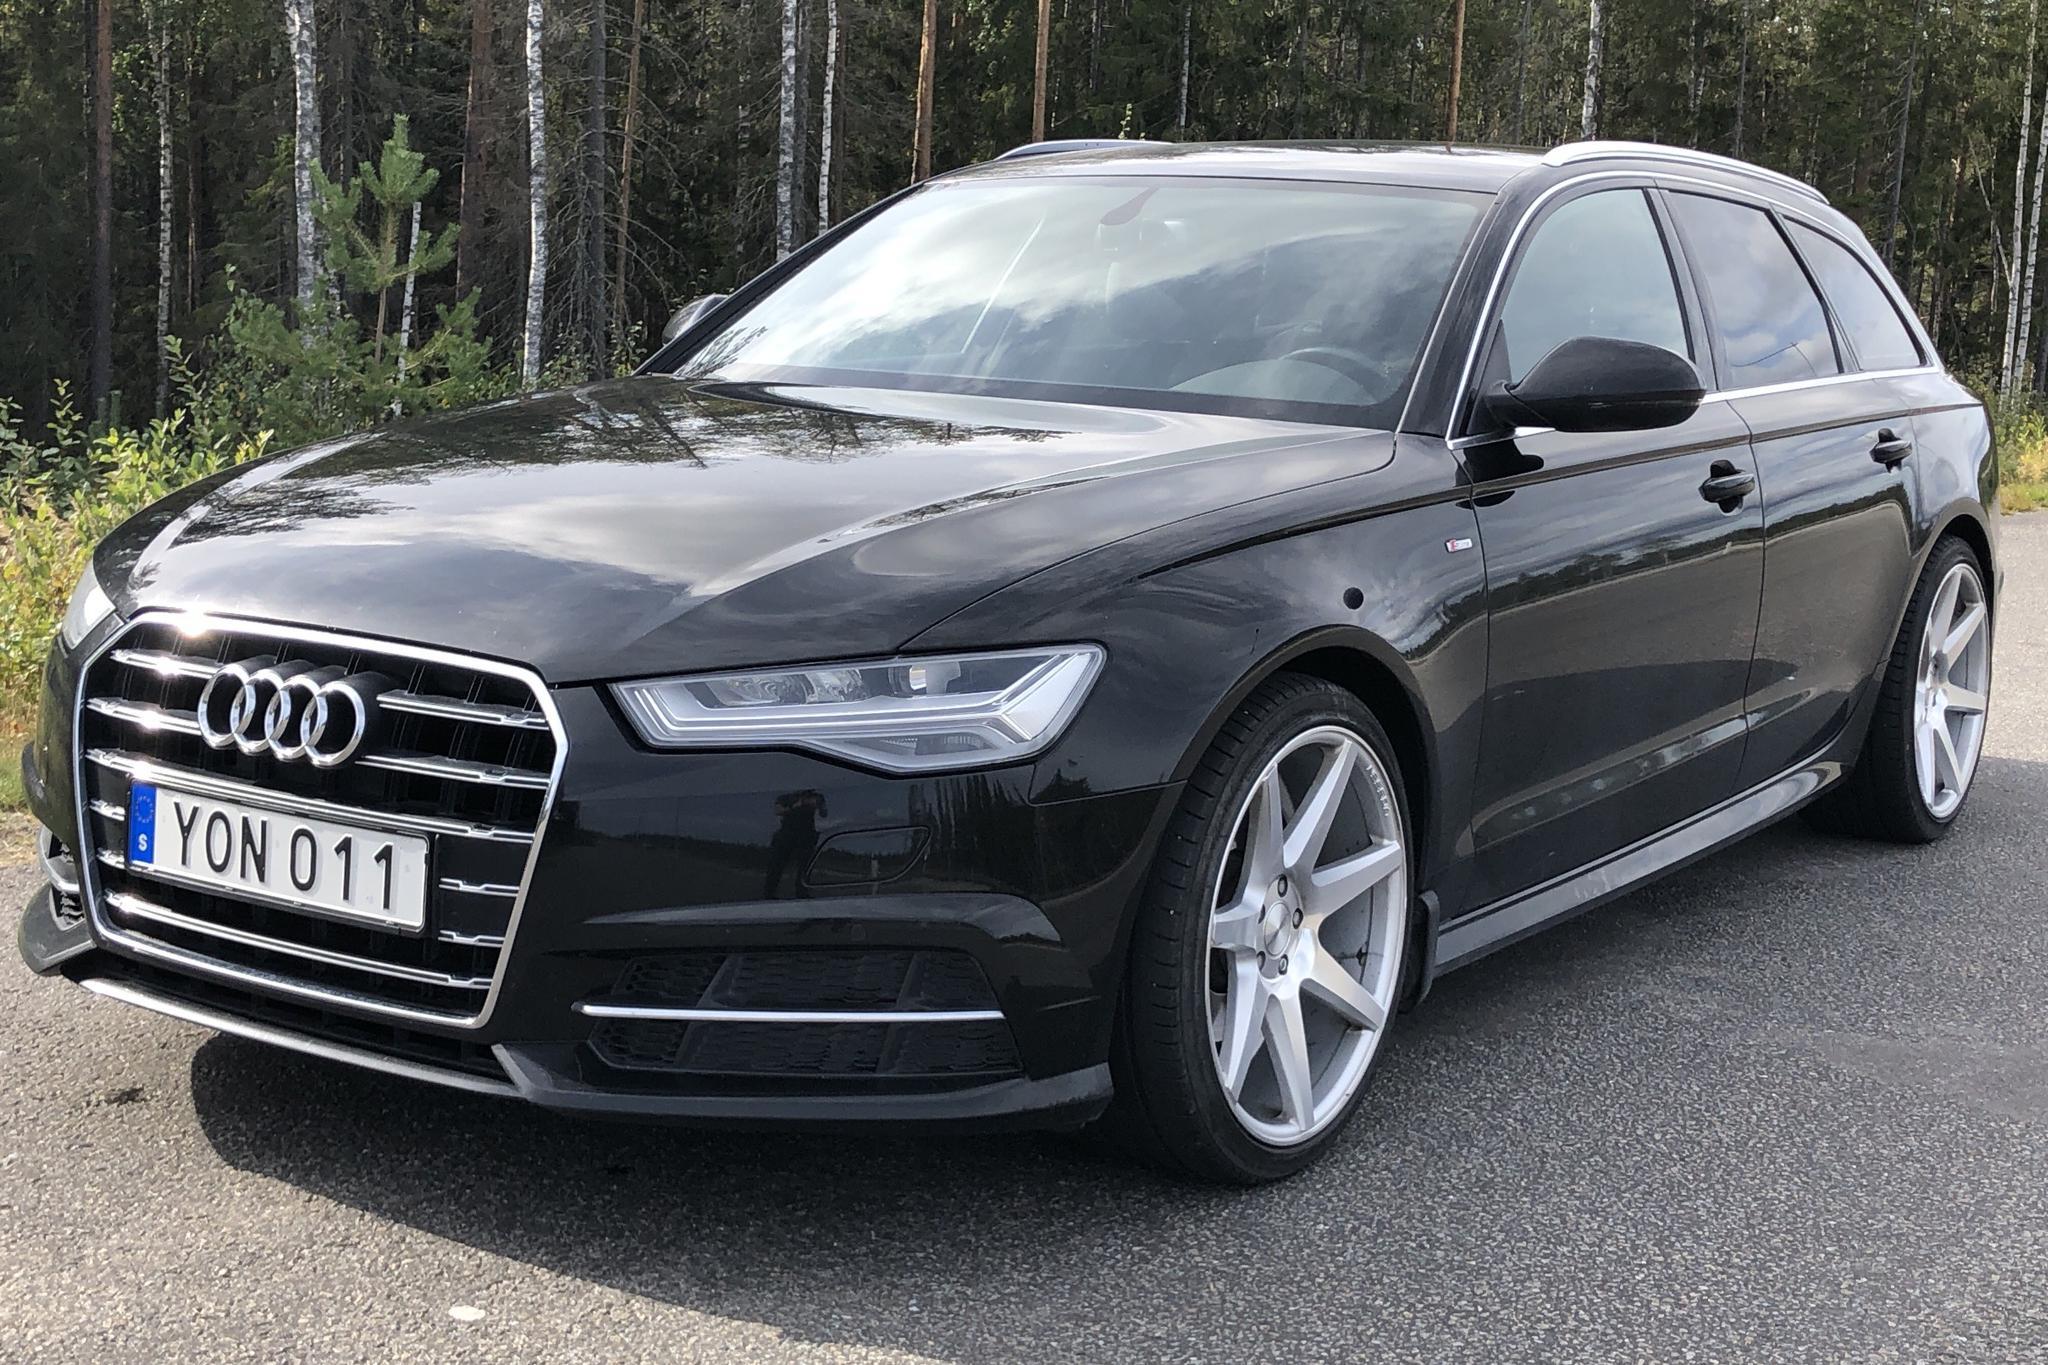 Audi A6 2.0 TDI Avant (190hk) - 6 547 mil - Automat - svart - 2018